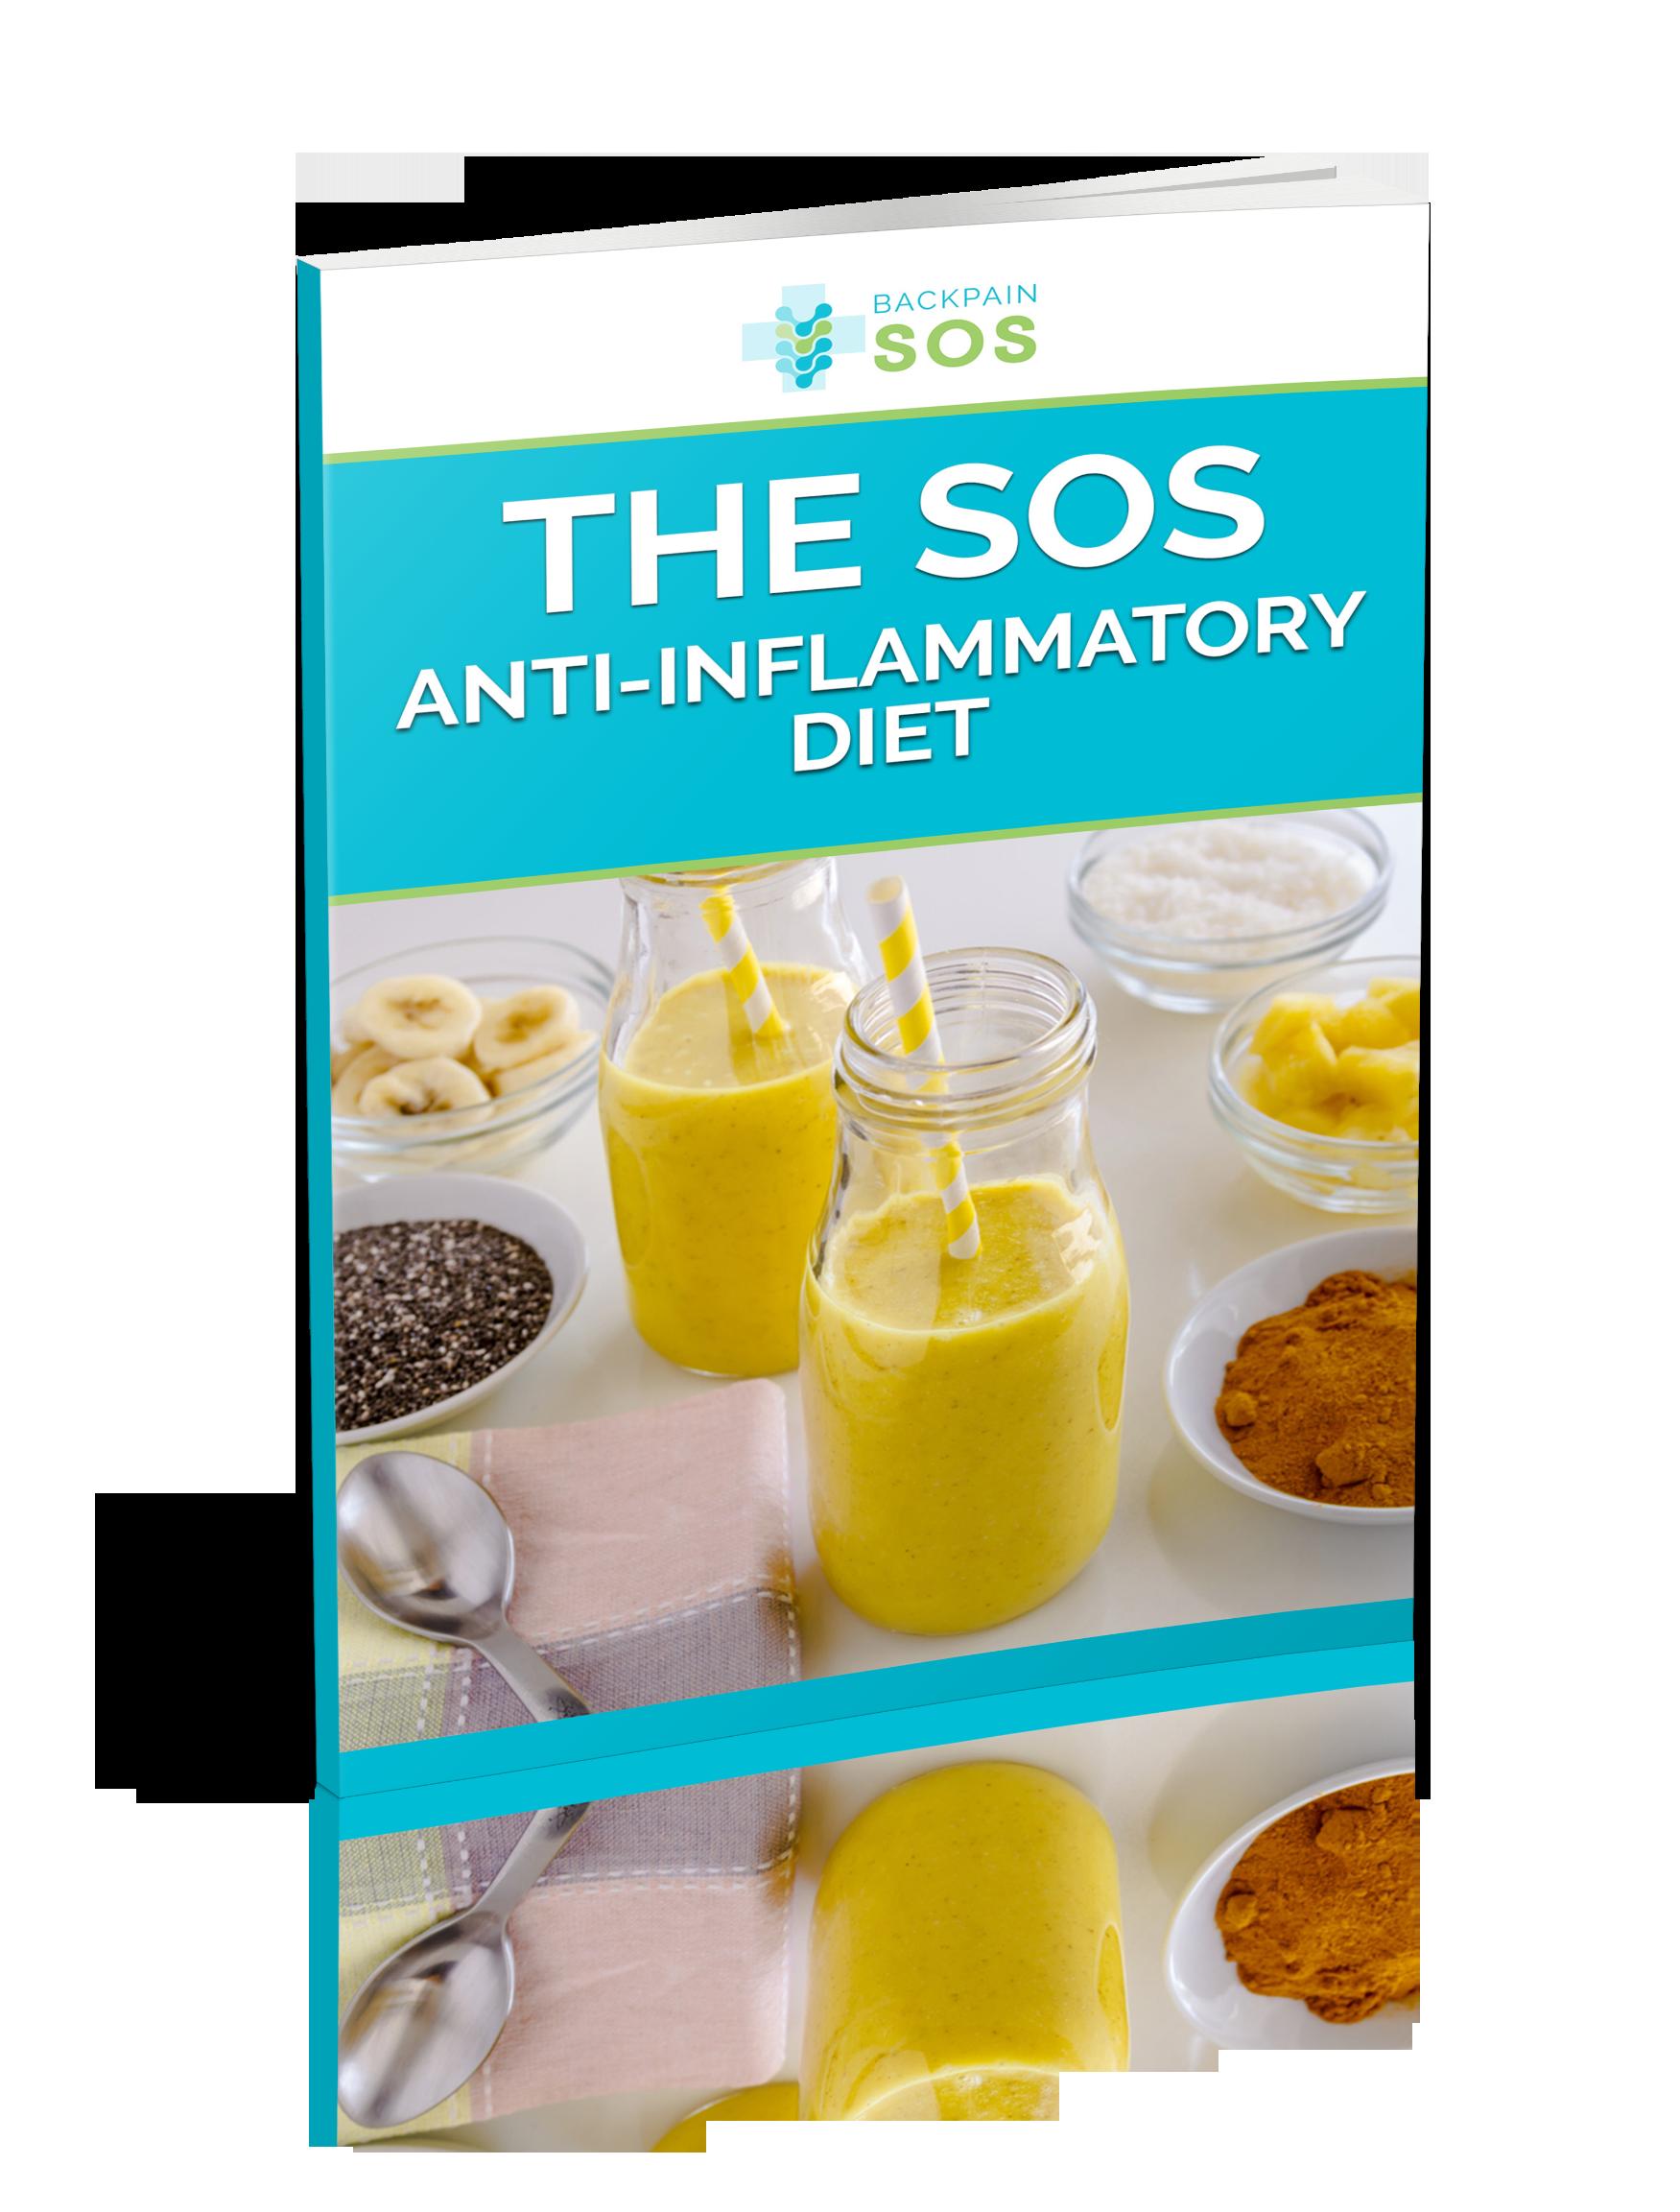 The SOS Anti-Inflammatory Diet